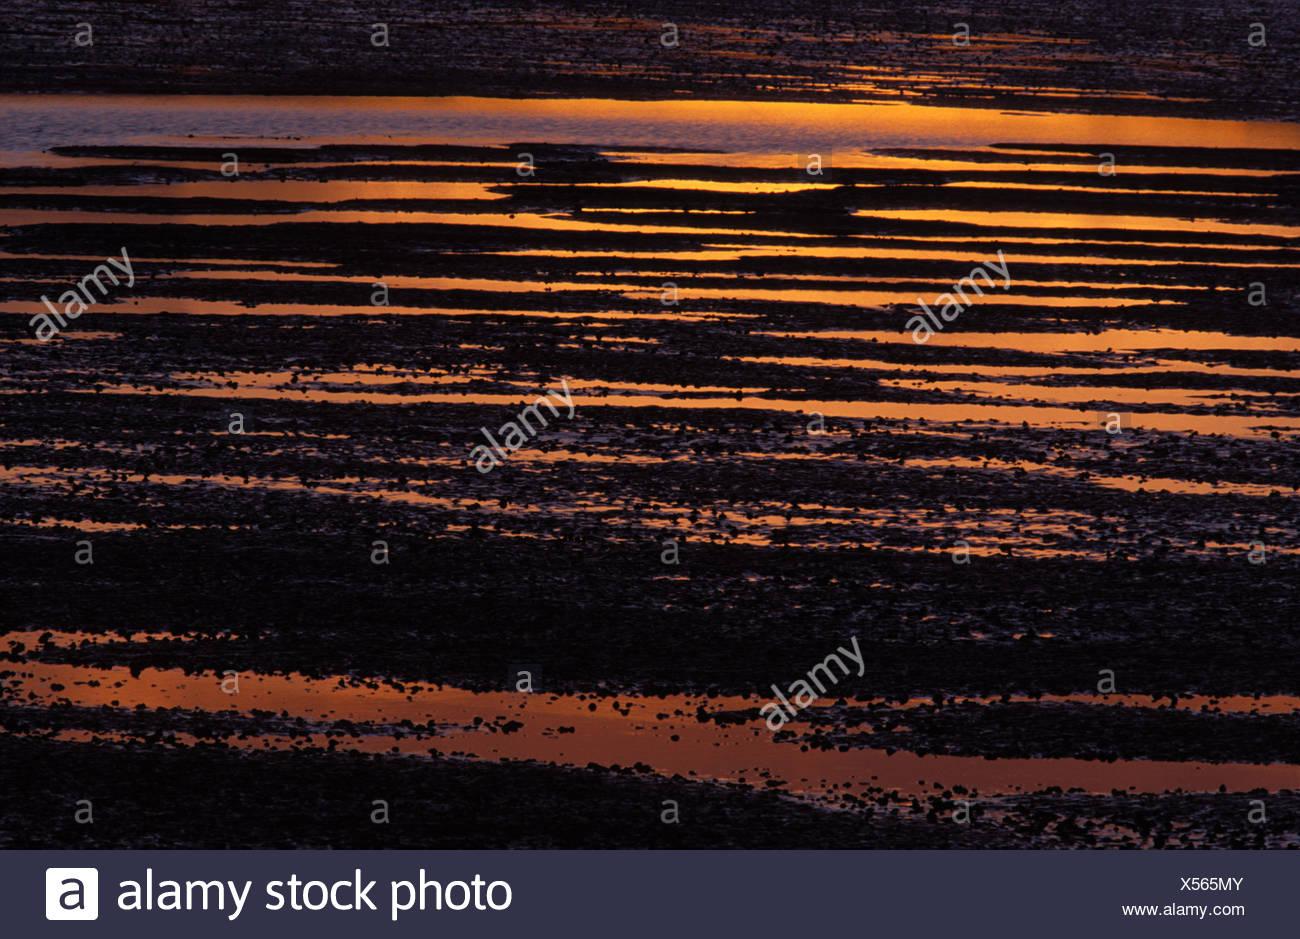 Sunset reflected in the estuarine mud Morecambe Bay Silverdale Lancashire - Stock Image